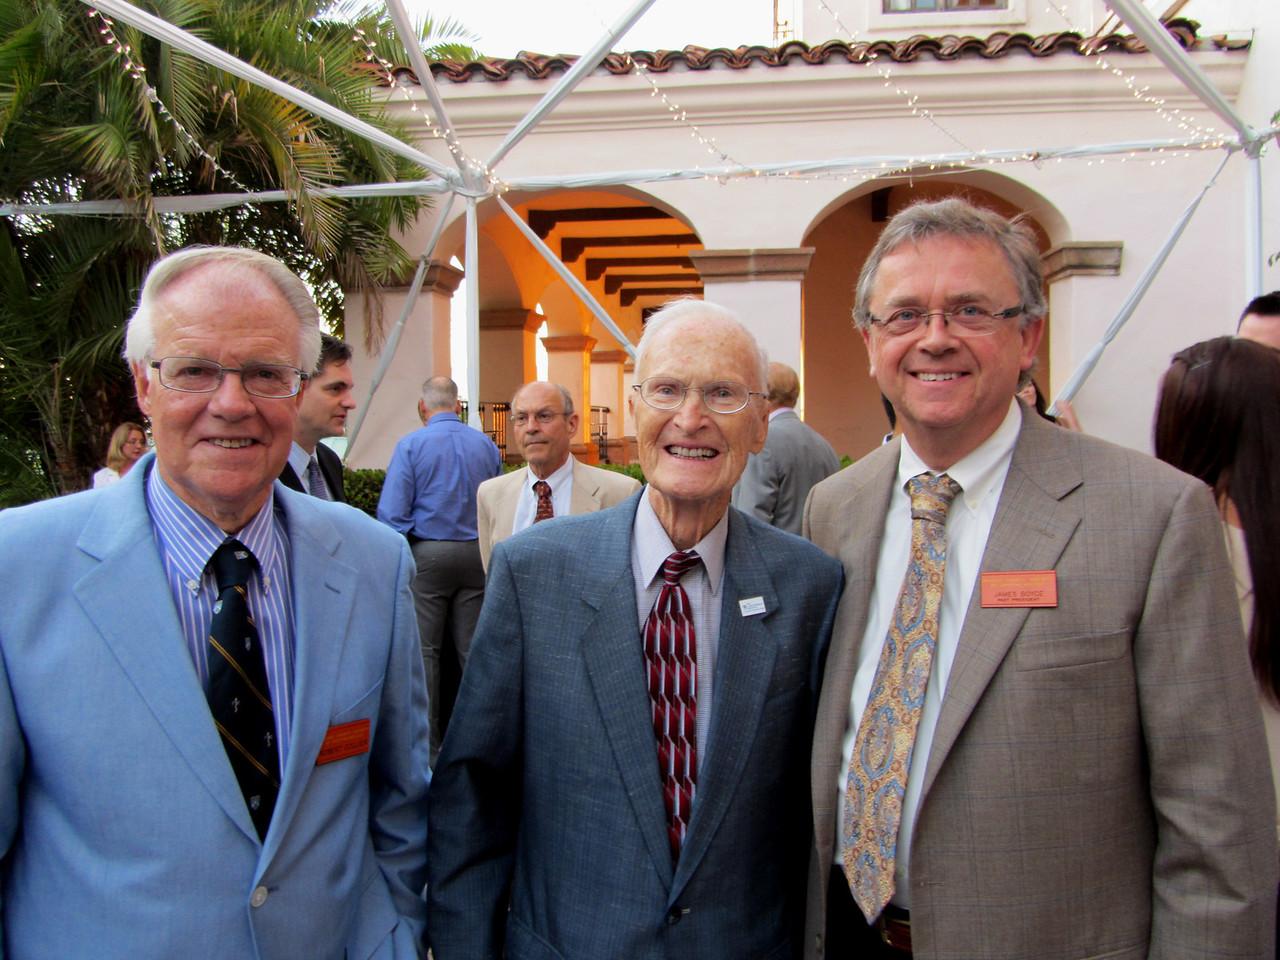 06 Bob Collier, Dick Kratz, Jim Boyce